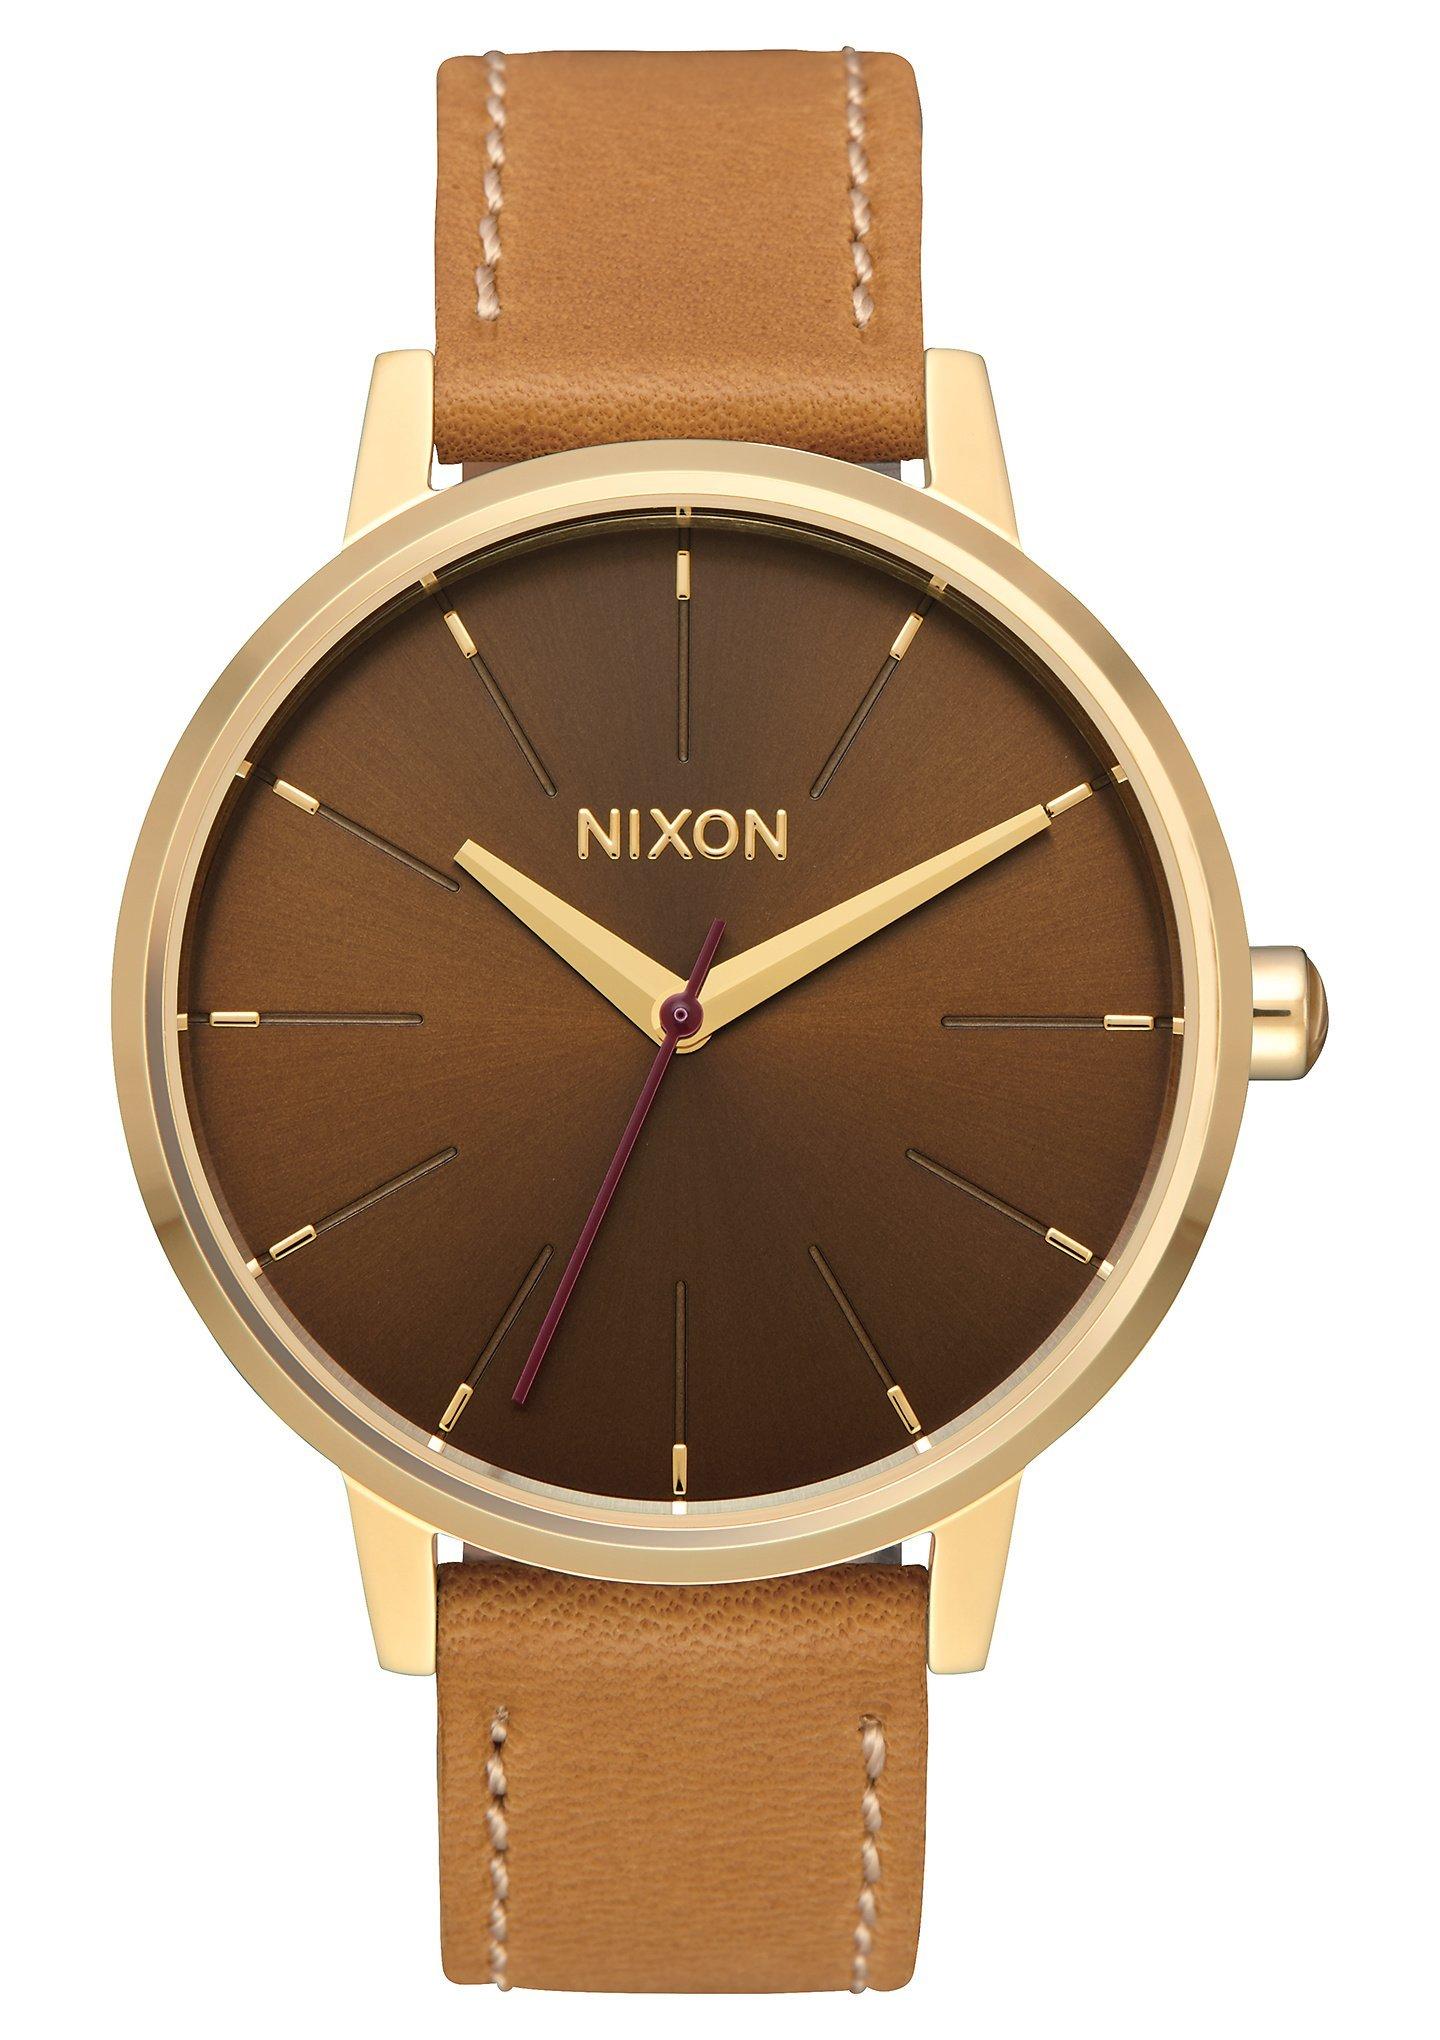 Ladies' Nixon Kensington Brown Leather Watch A108-2804-00 by NIXON